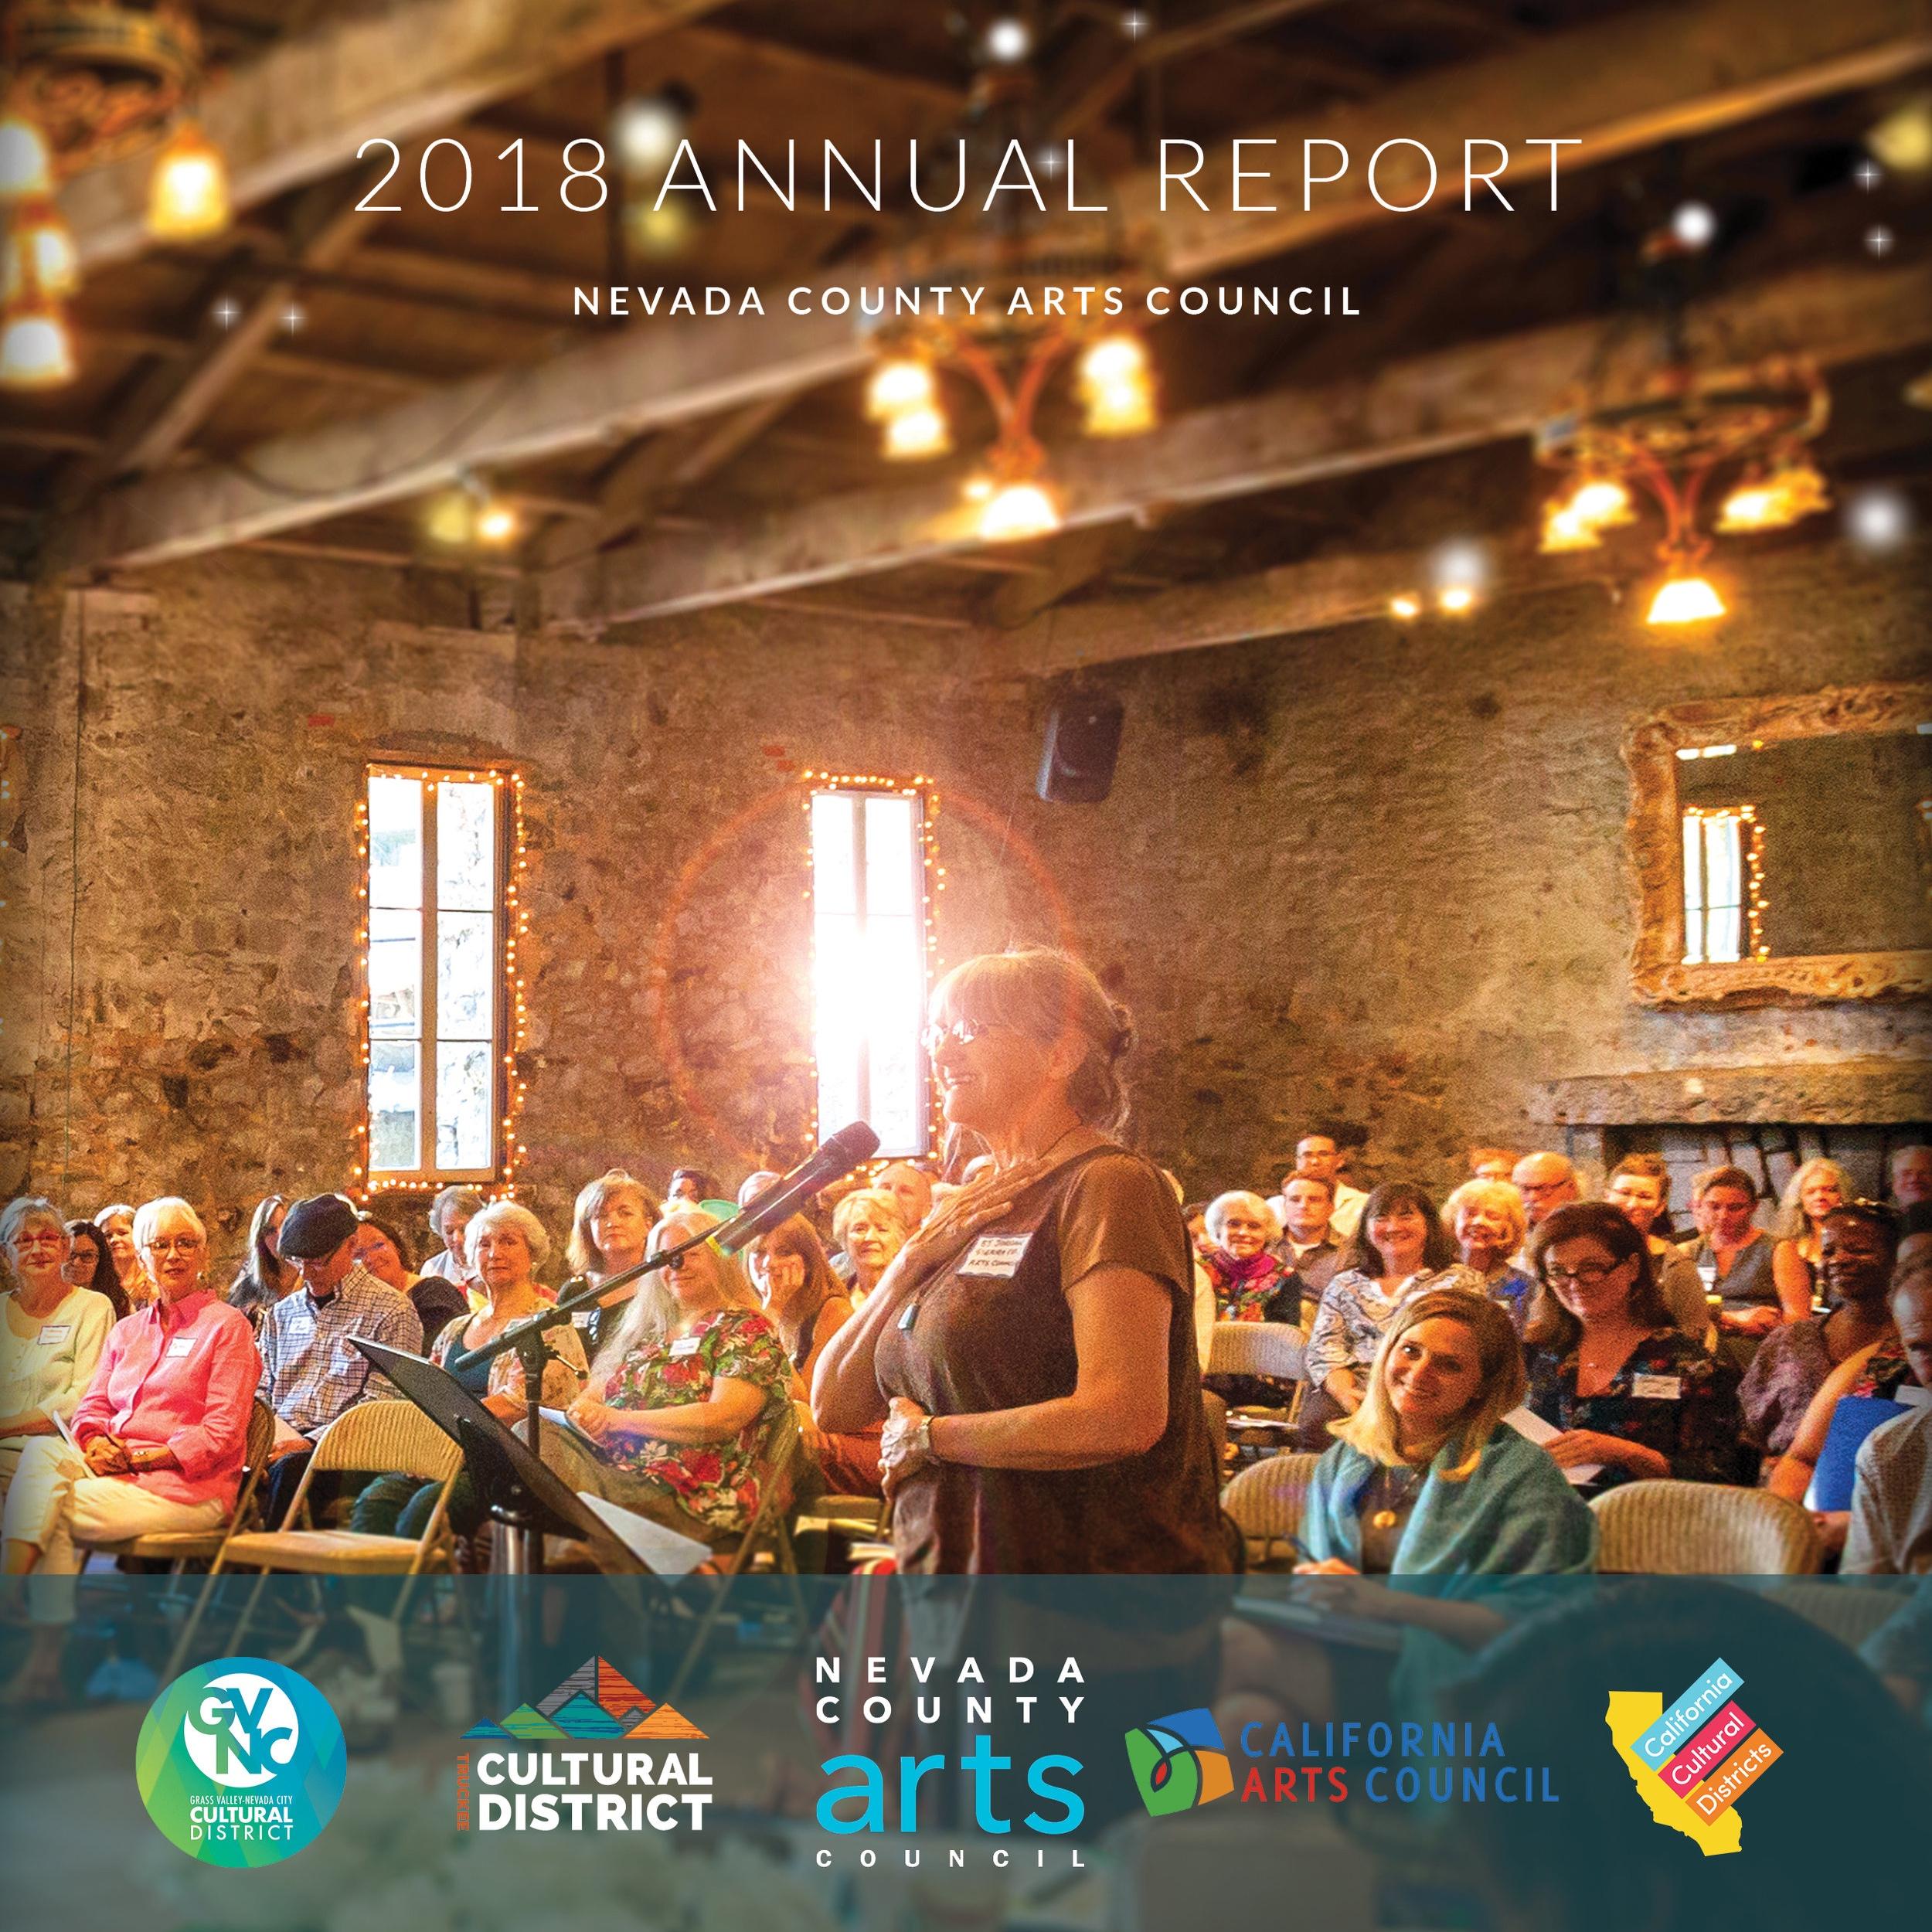 2018 Annual Report: Nevada County Arts Council